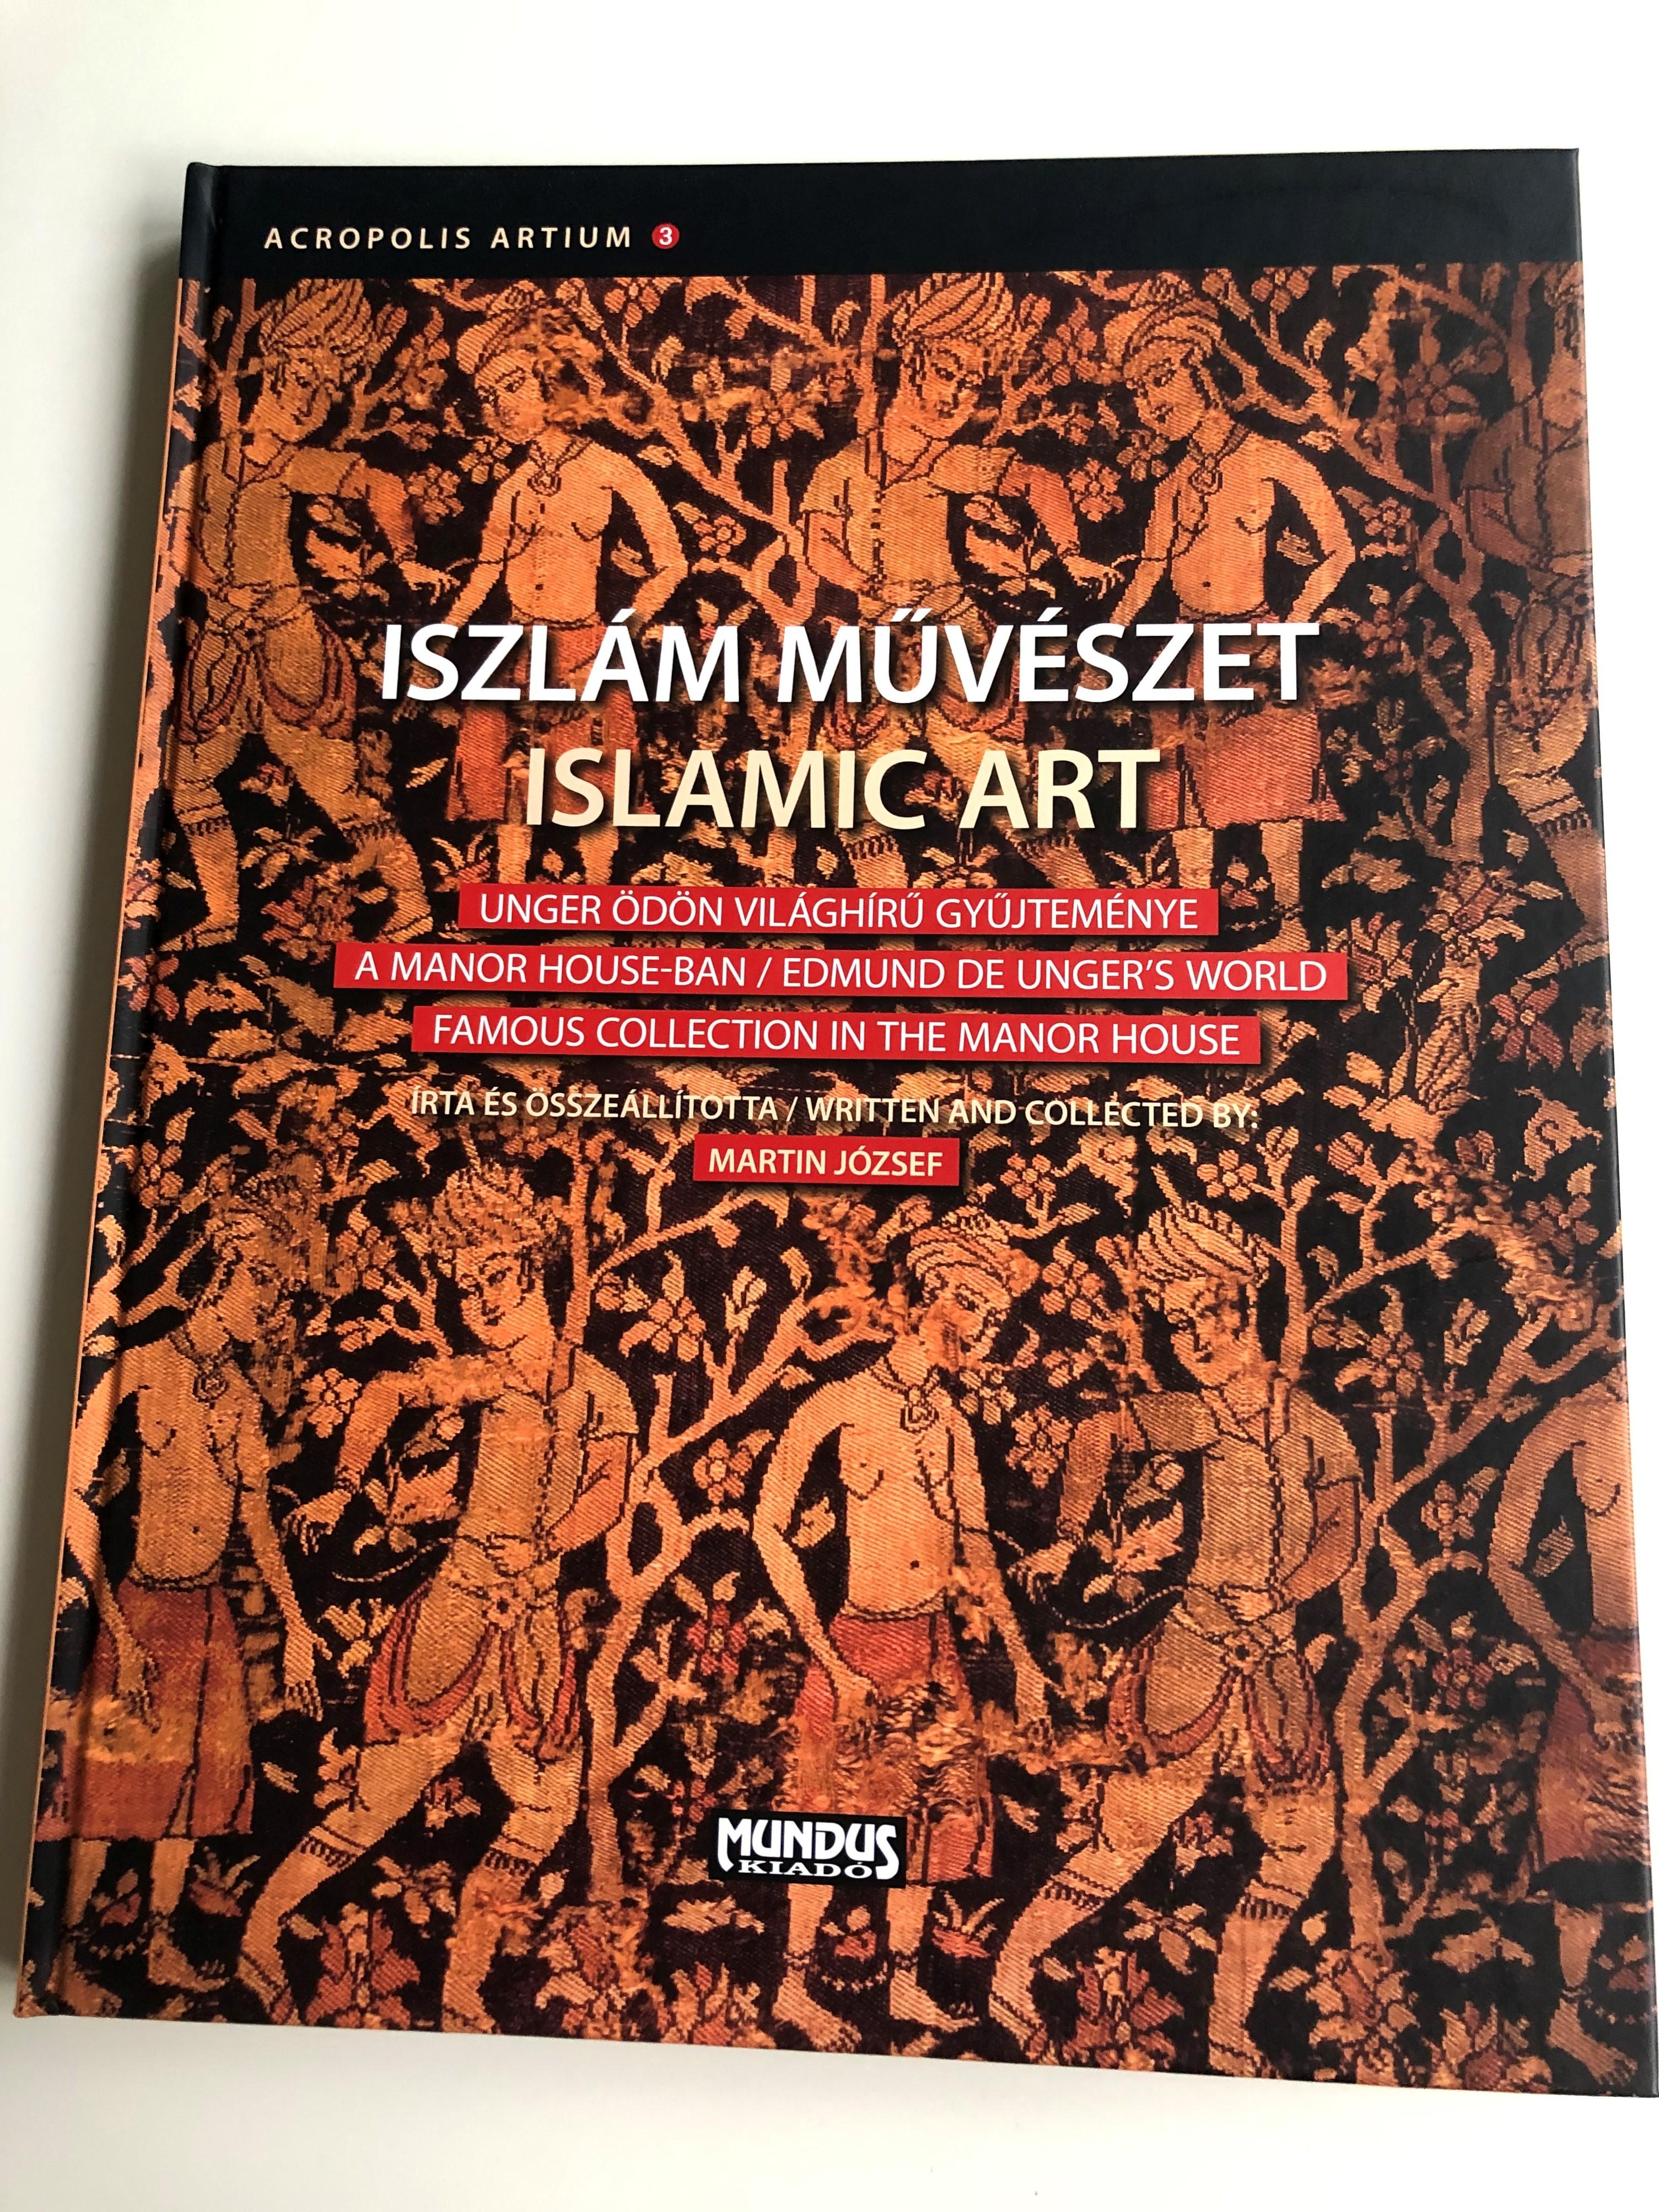 islamic-art-iszl-m-m-v-szet-by-martin-j-zsef-a-manor-house-ban-1.jpg